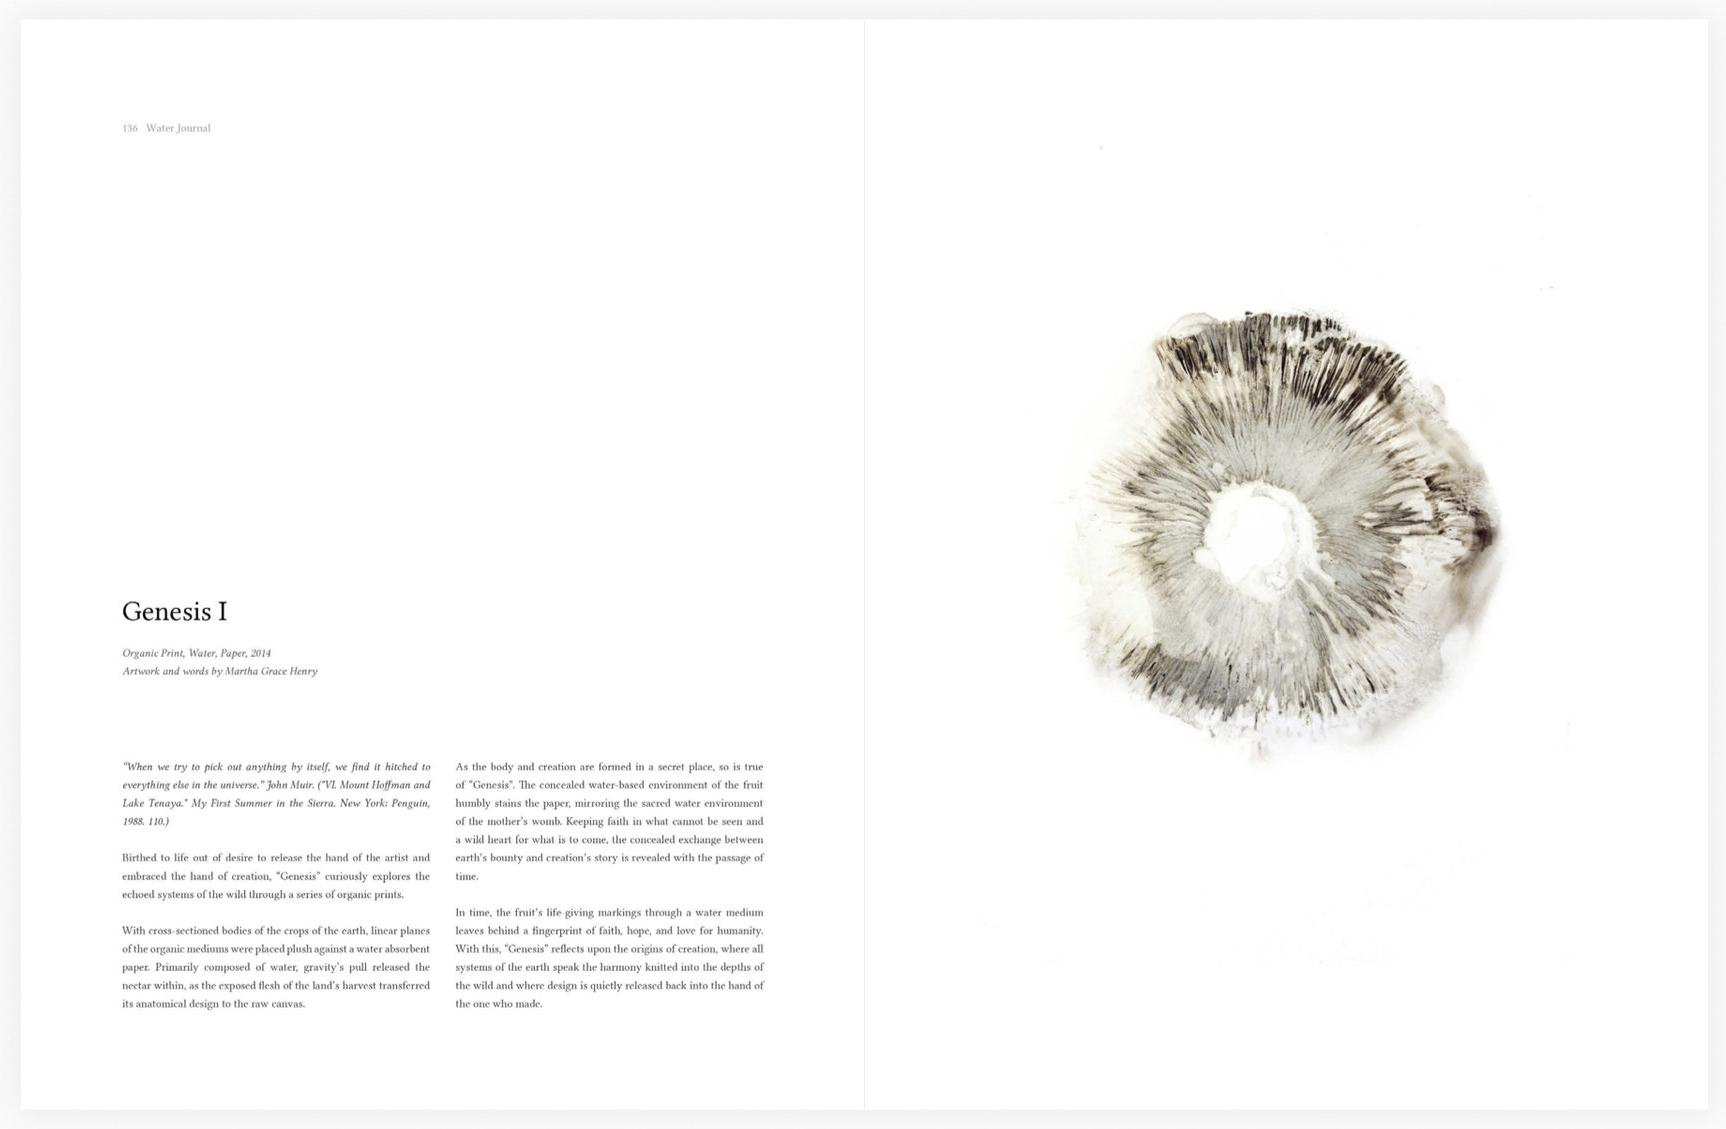 Water Journal Volume 1° — Martha Grace Henry (dragged) 2.jpg